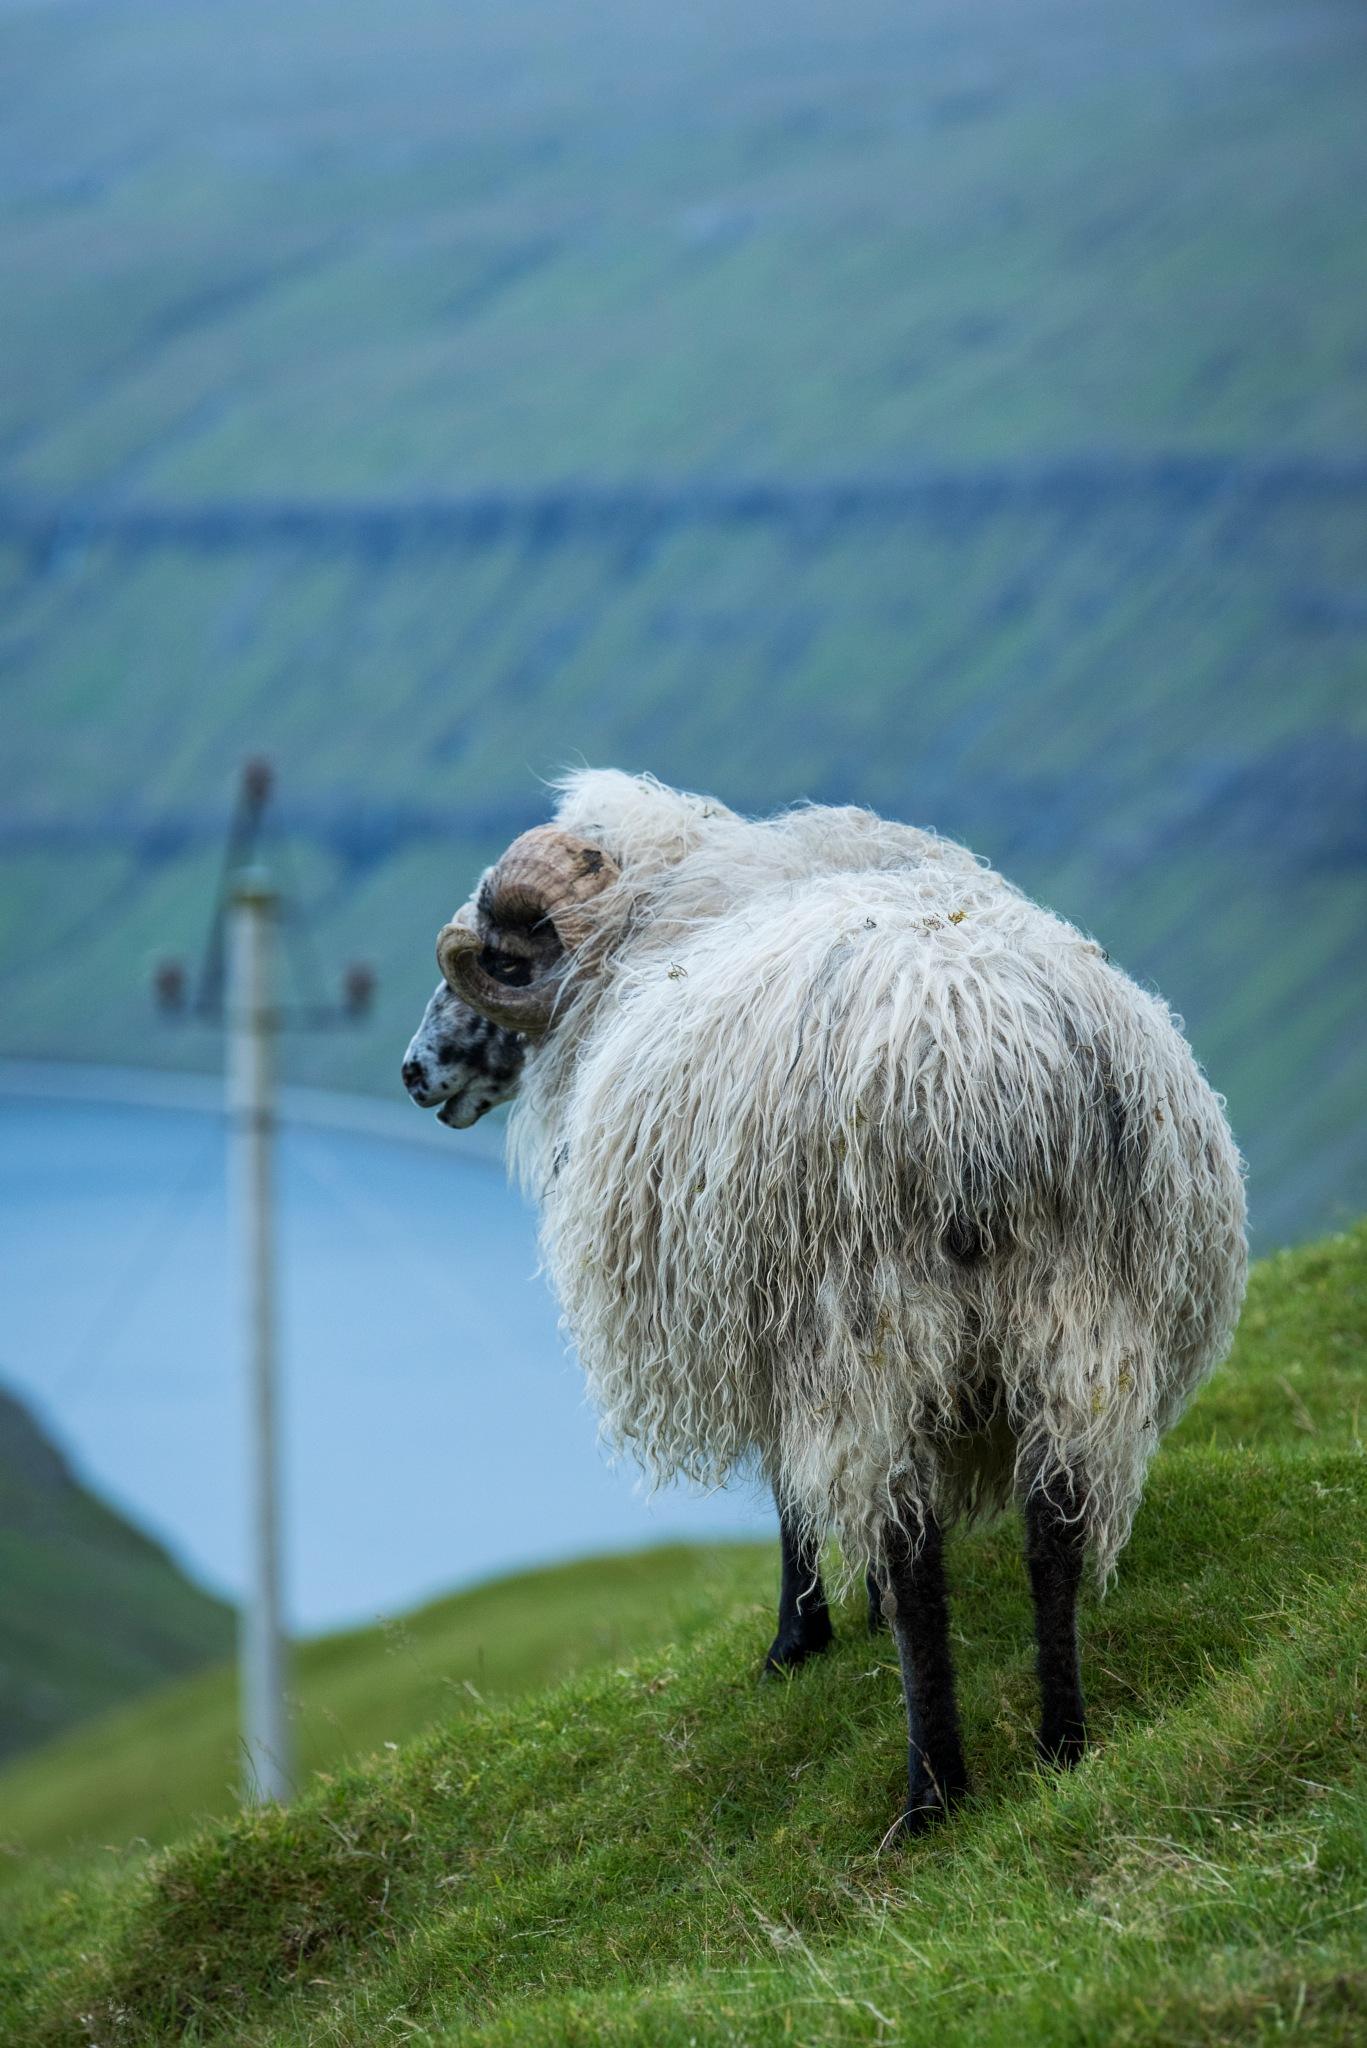 The Ram by harald bjørgvin